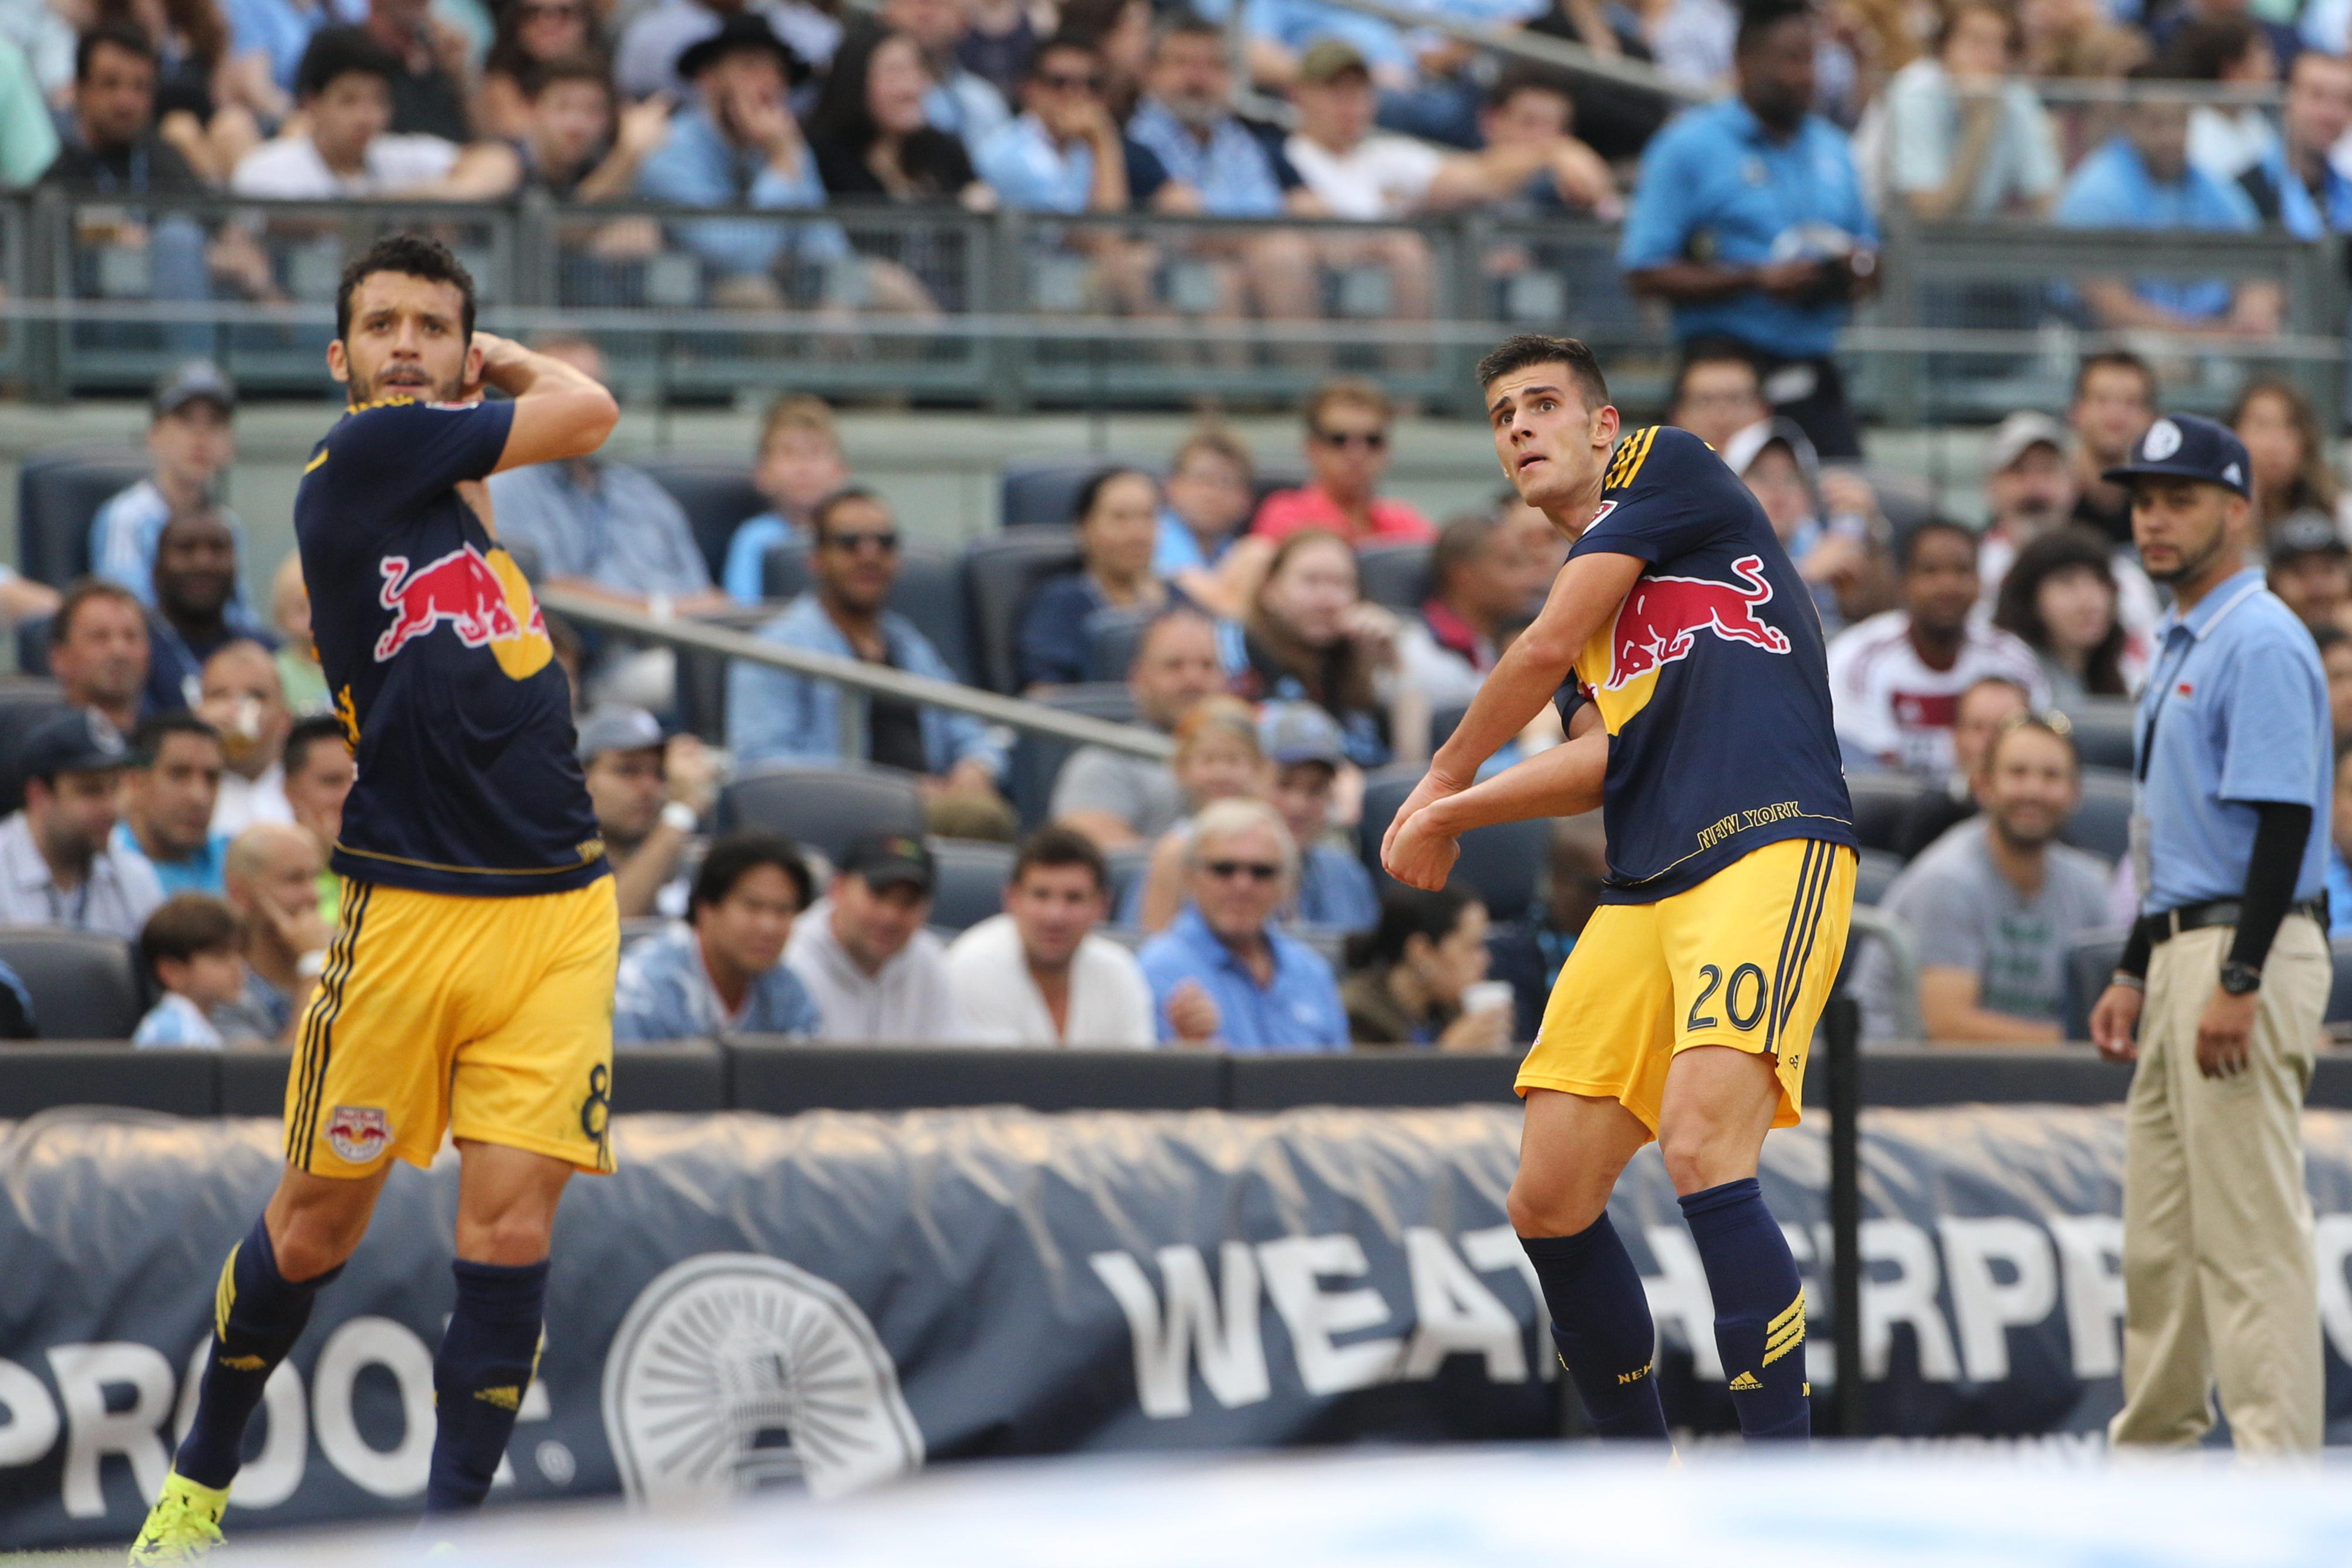 Soccer - MLS - NYCFC vs. New York Red Bulls